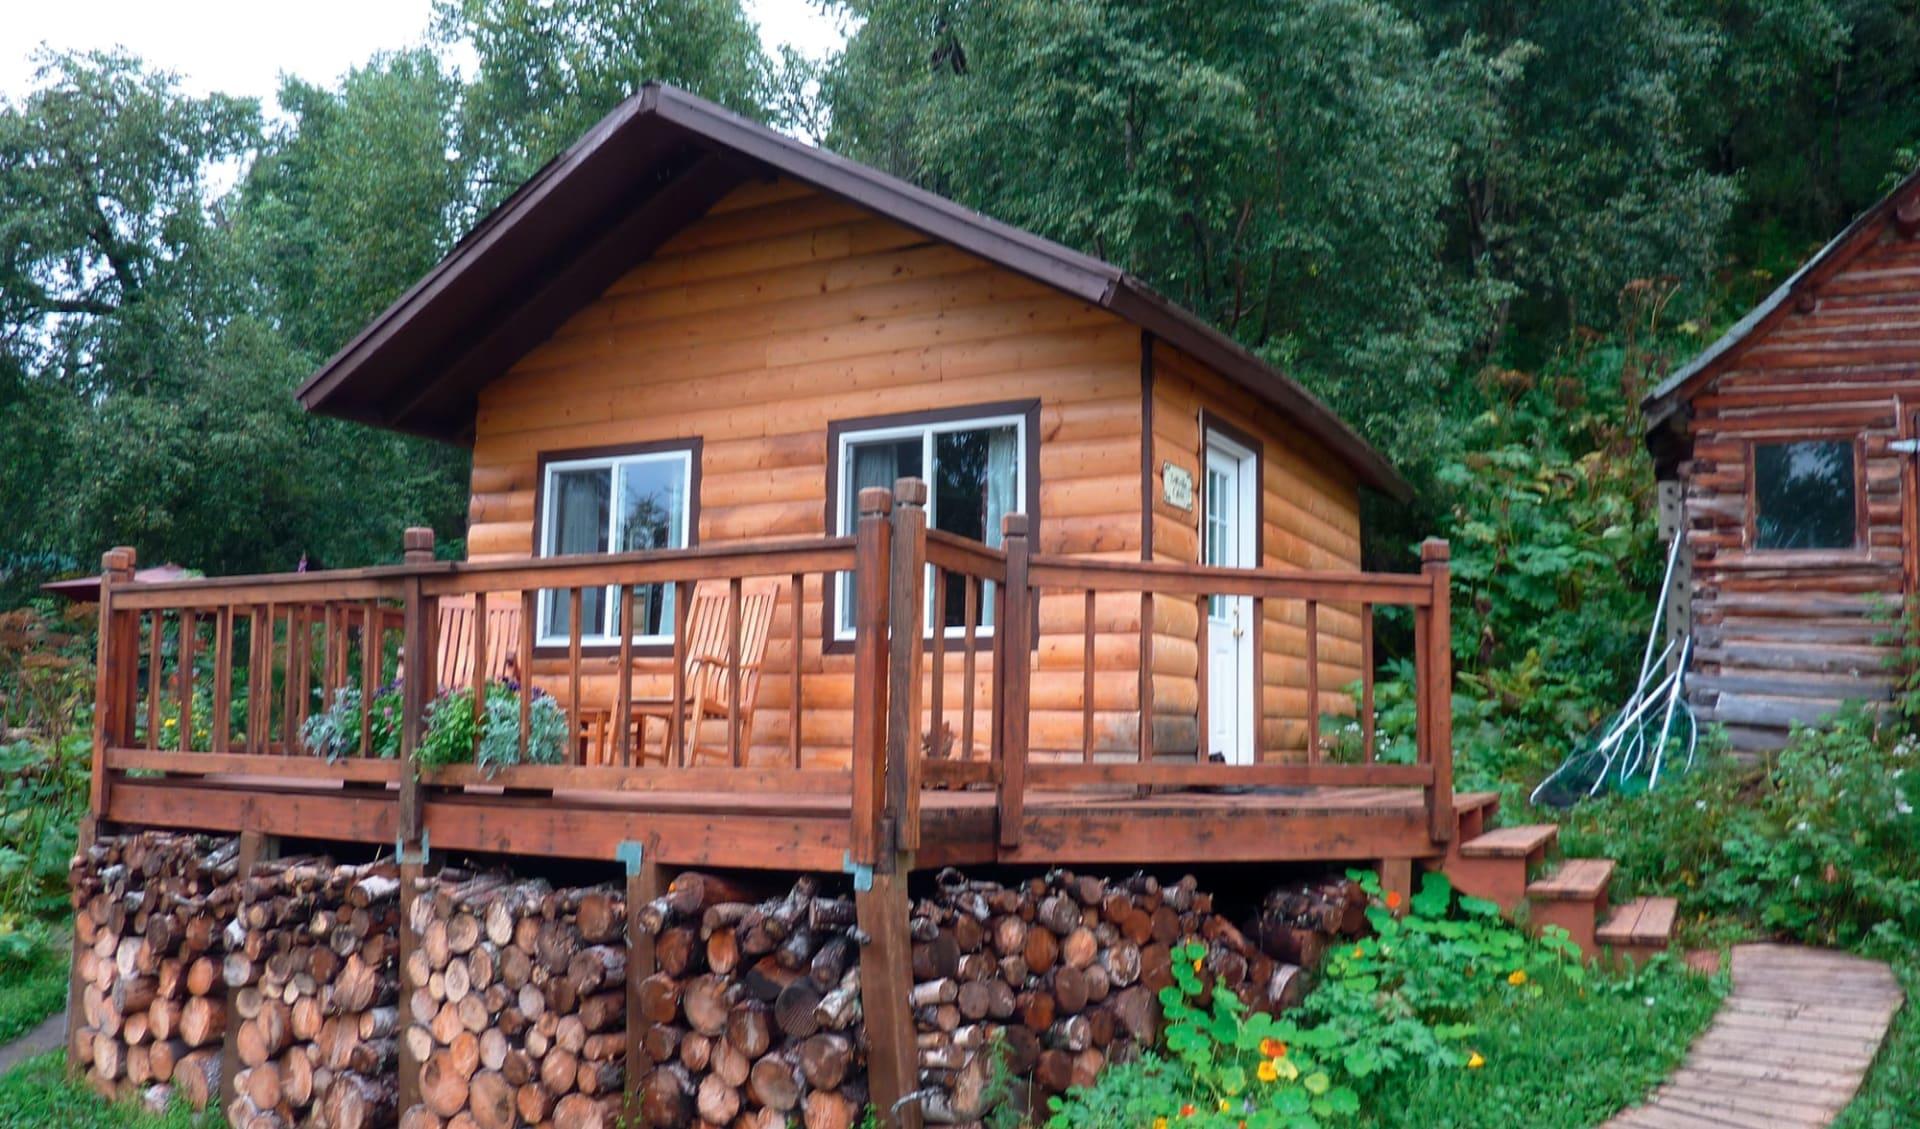 Redoubt Bay Lodge:  2016_083_01_Redoubt Bay Lodge Trailside Cabin